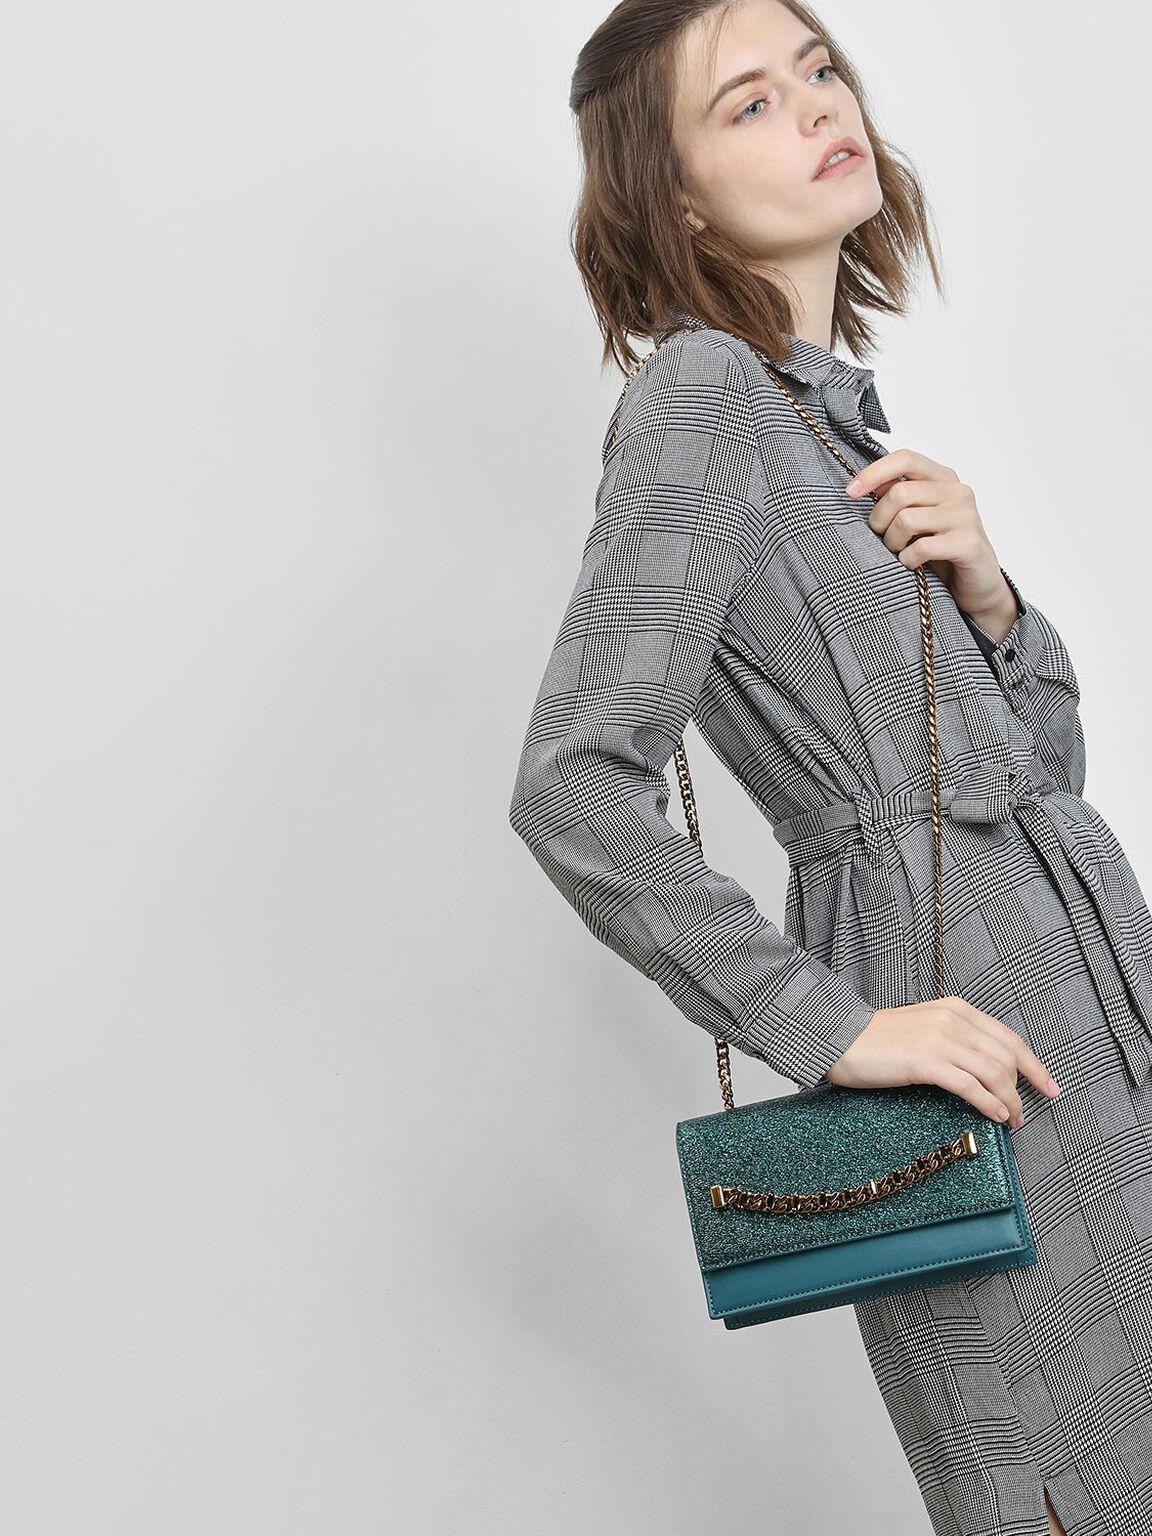 Chain Detail Front Flap Bag, Teal, hi-res